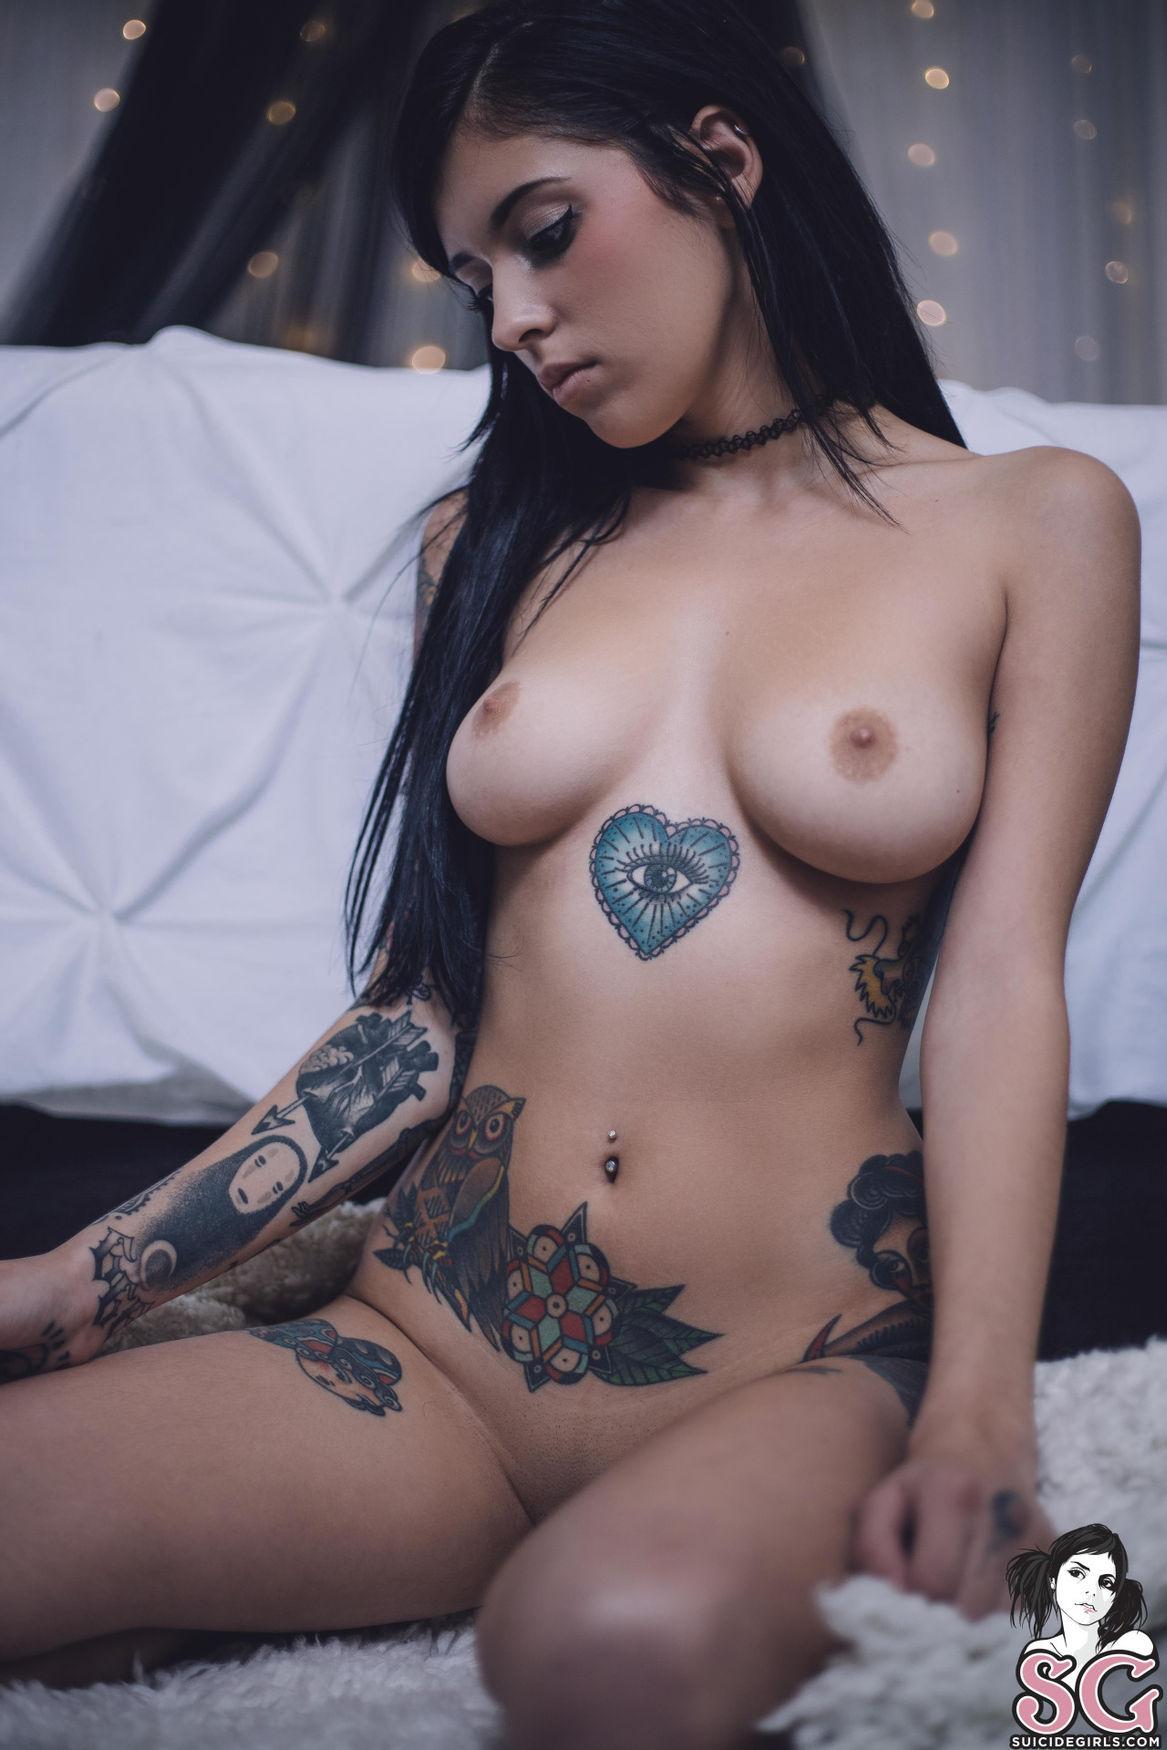 Nice ink..😍😚